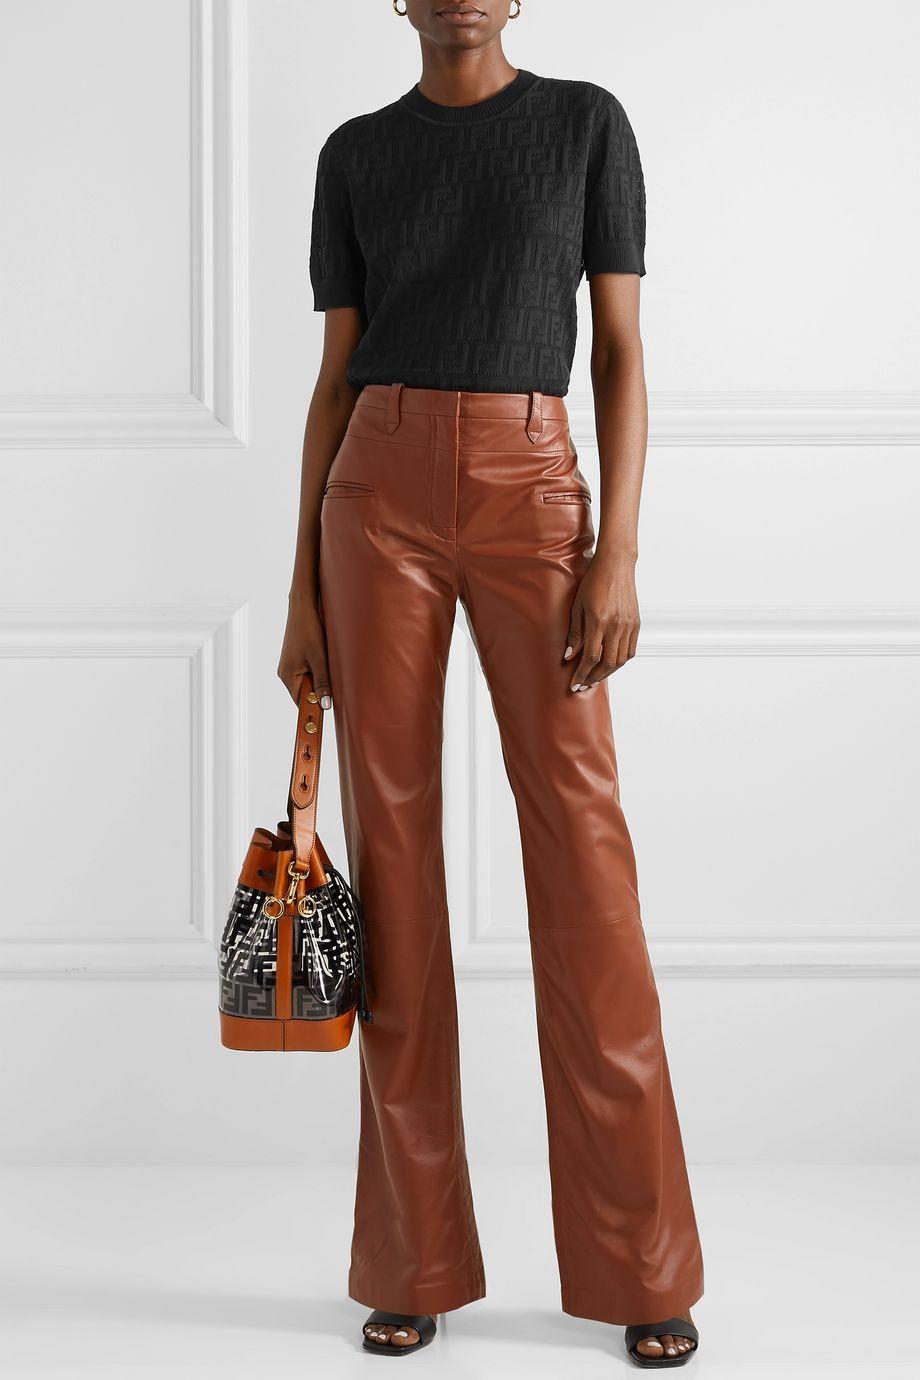 Fendi Pointelle-knit cotton-blend top